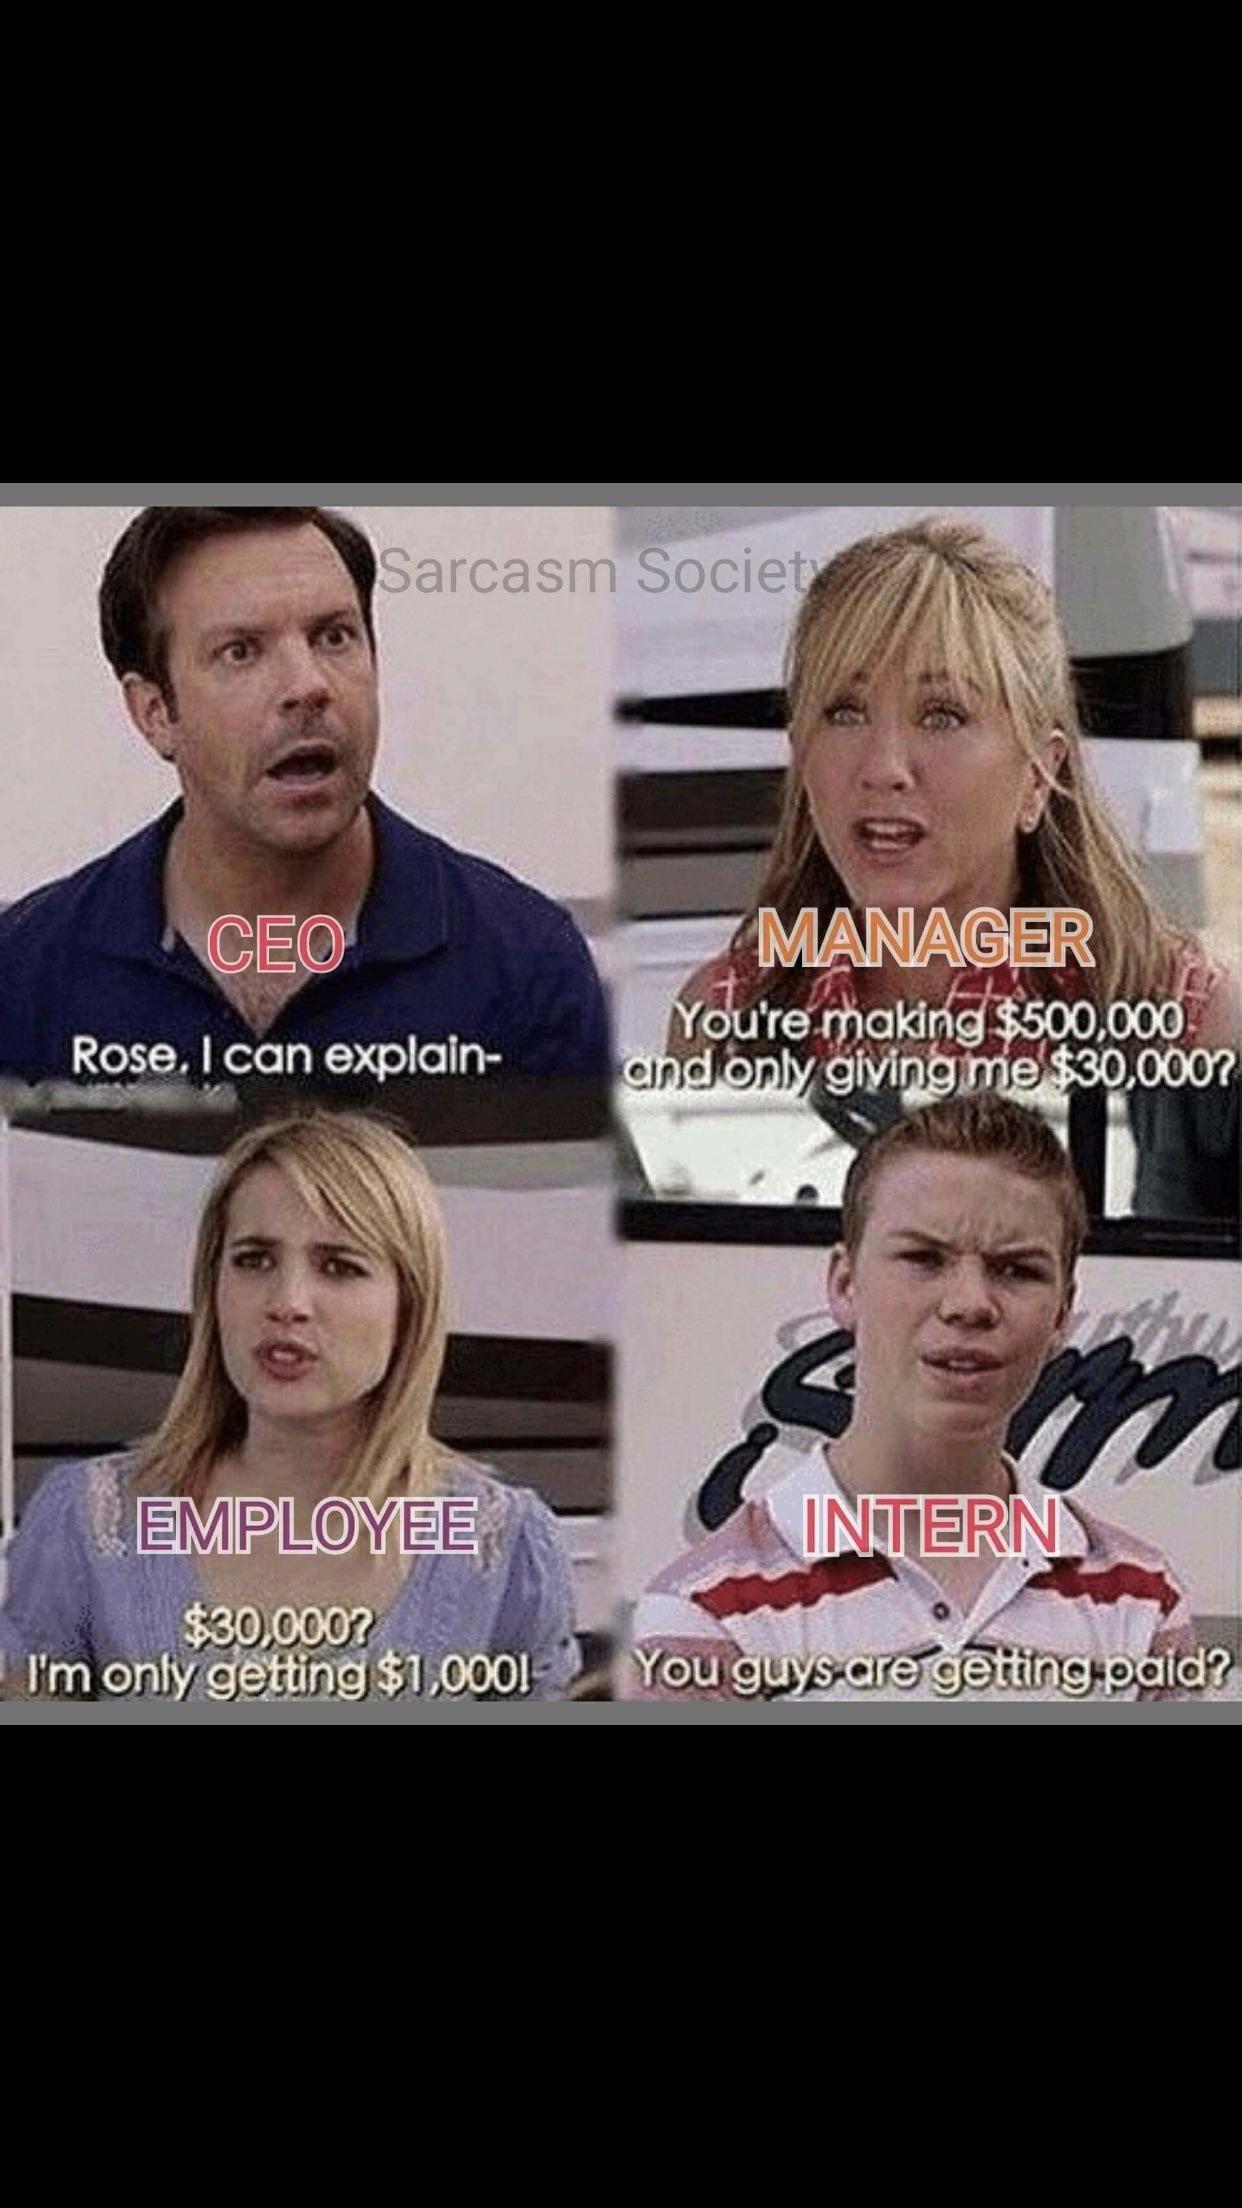 The intern struggle...